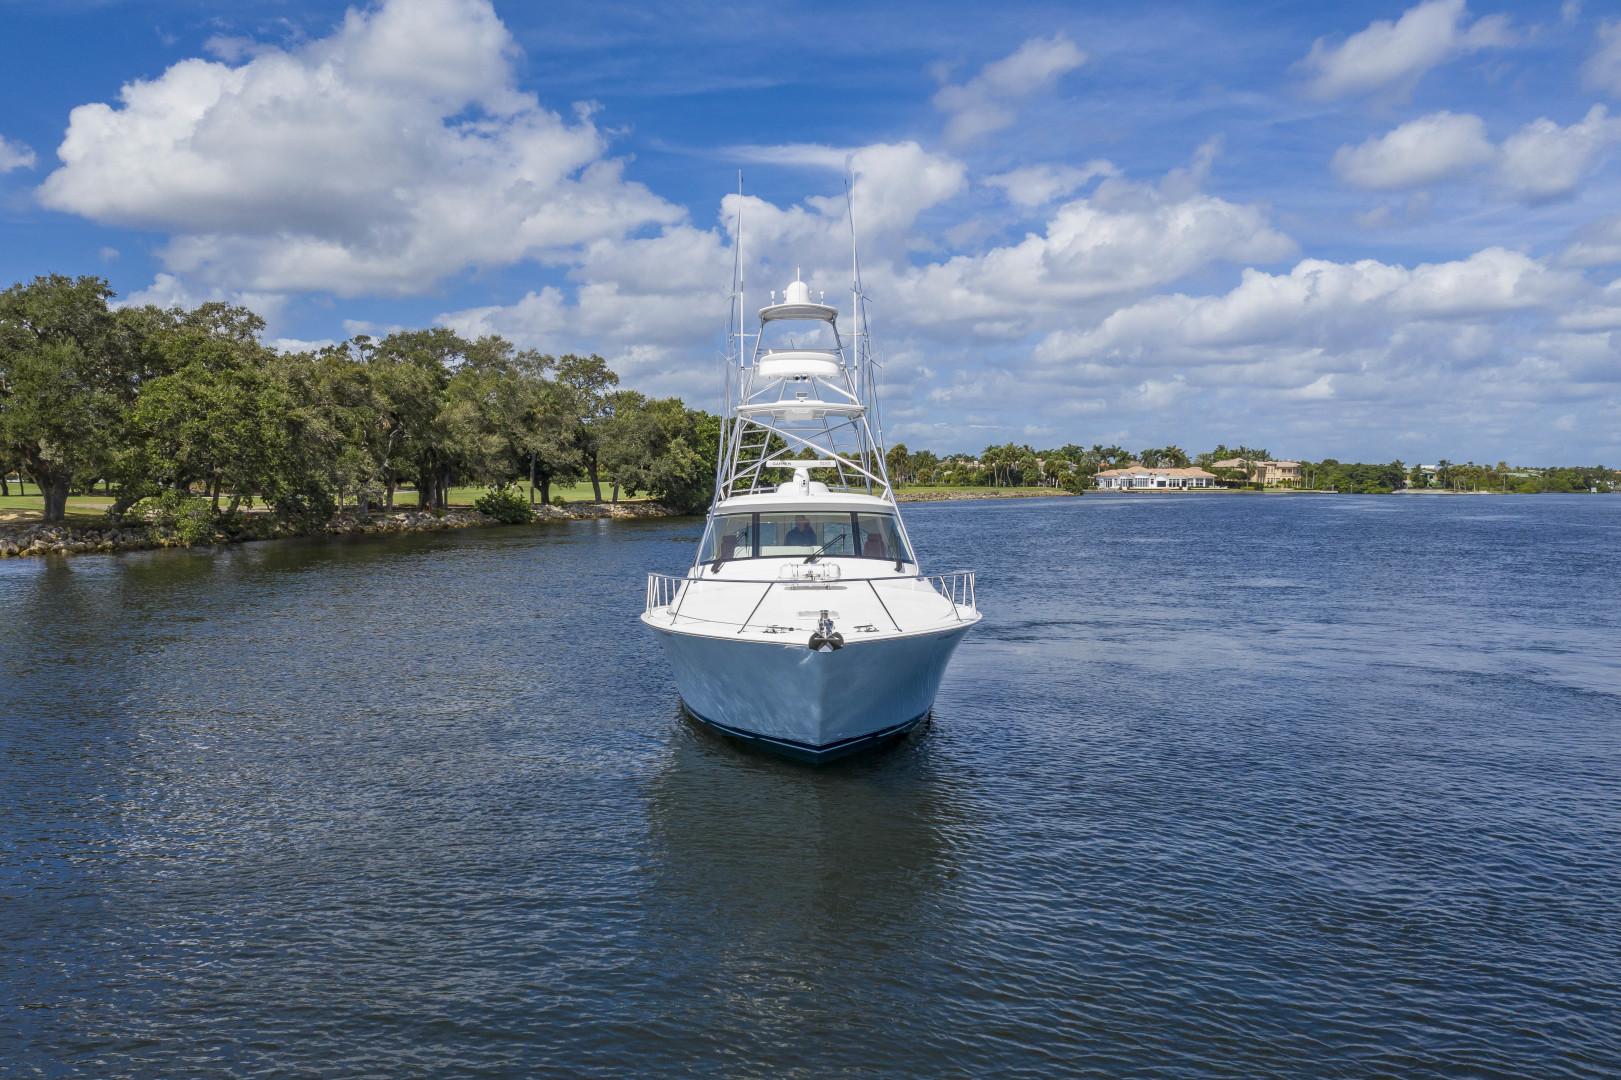 Viking-Sport Tower 2019-Salt Shaker II North Palm Beach-Florida-United States-Salt Shaker II-1498755 | Thumbnail